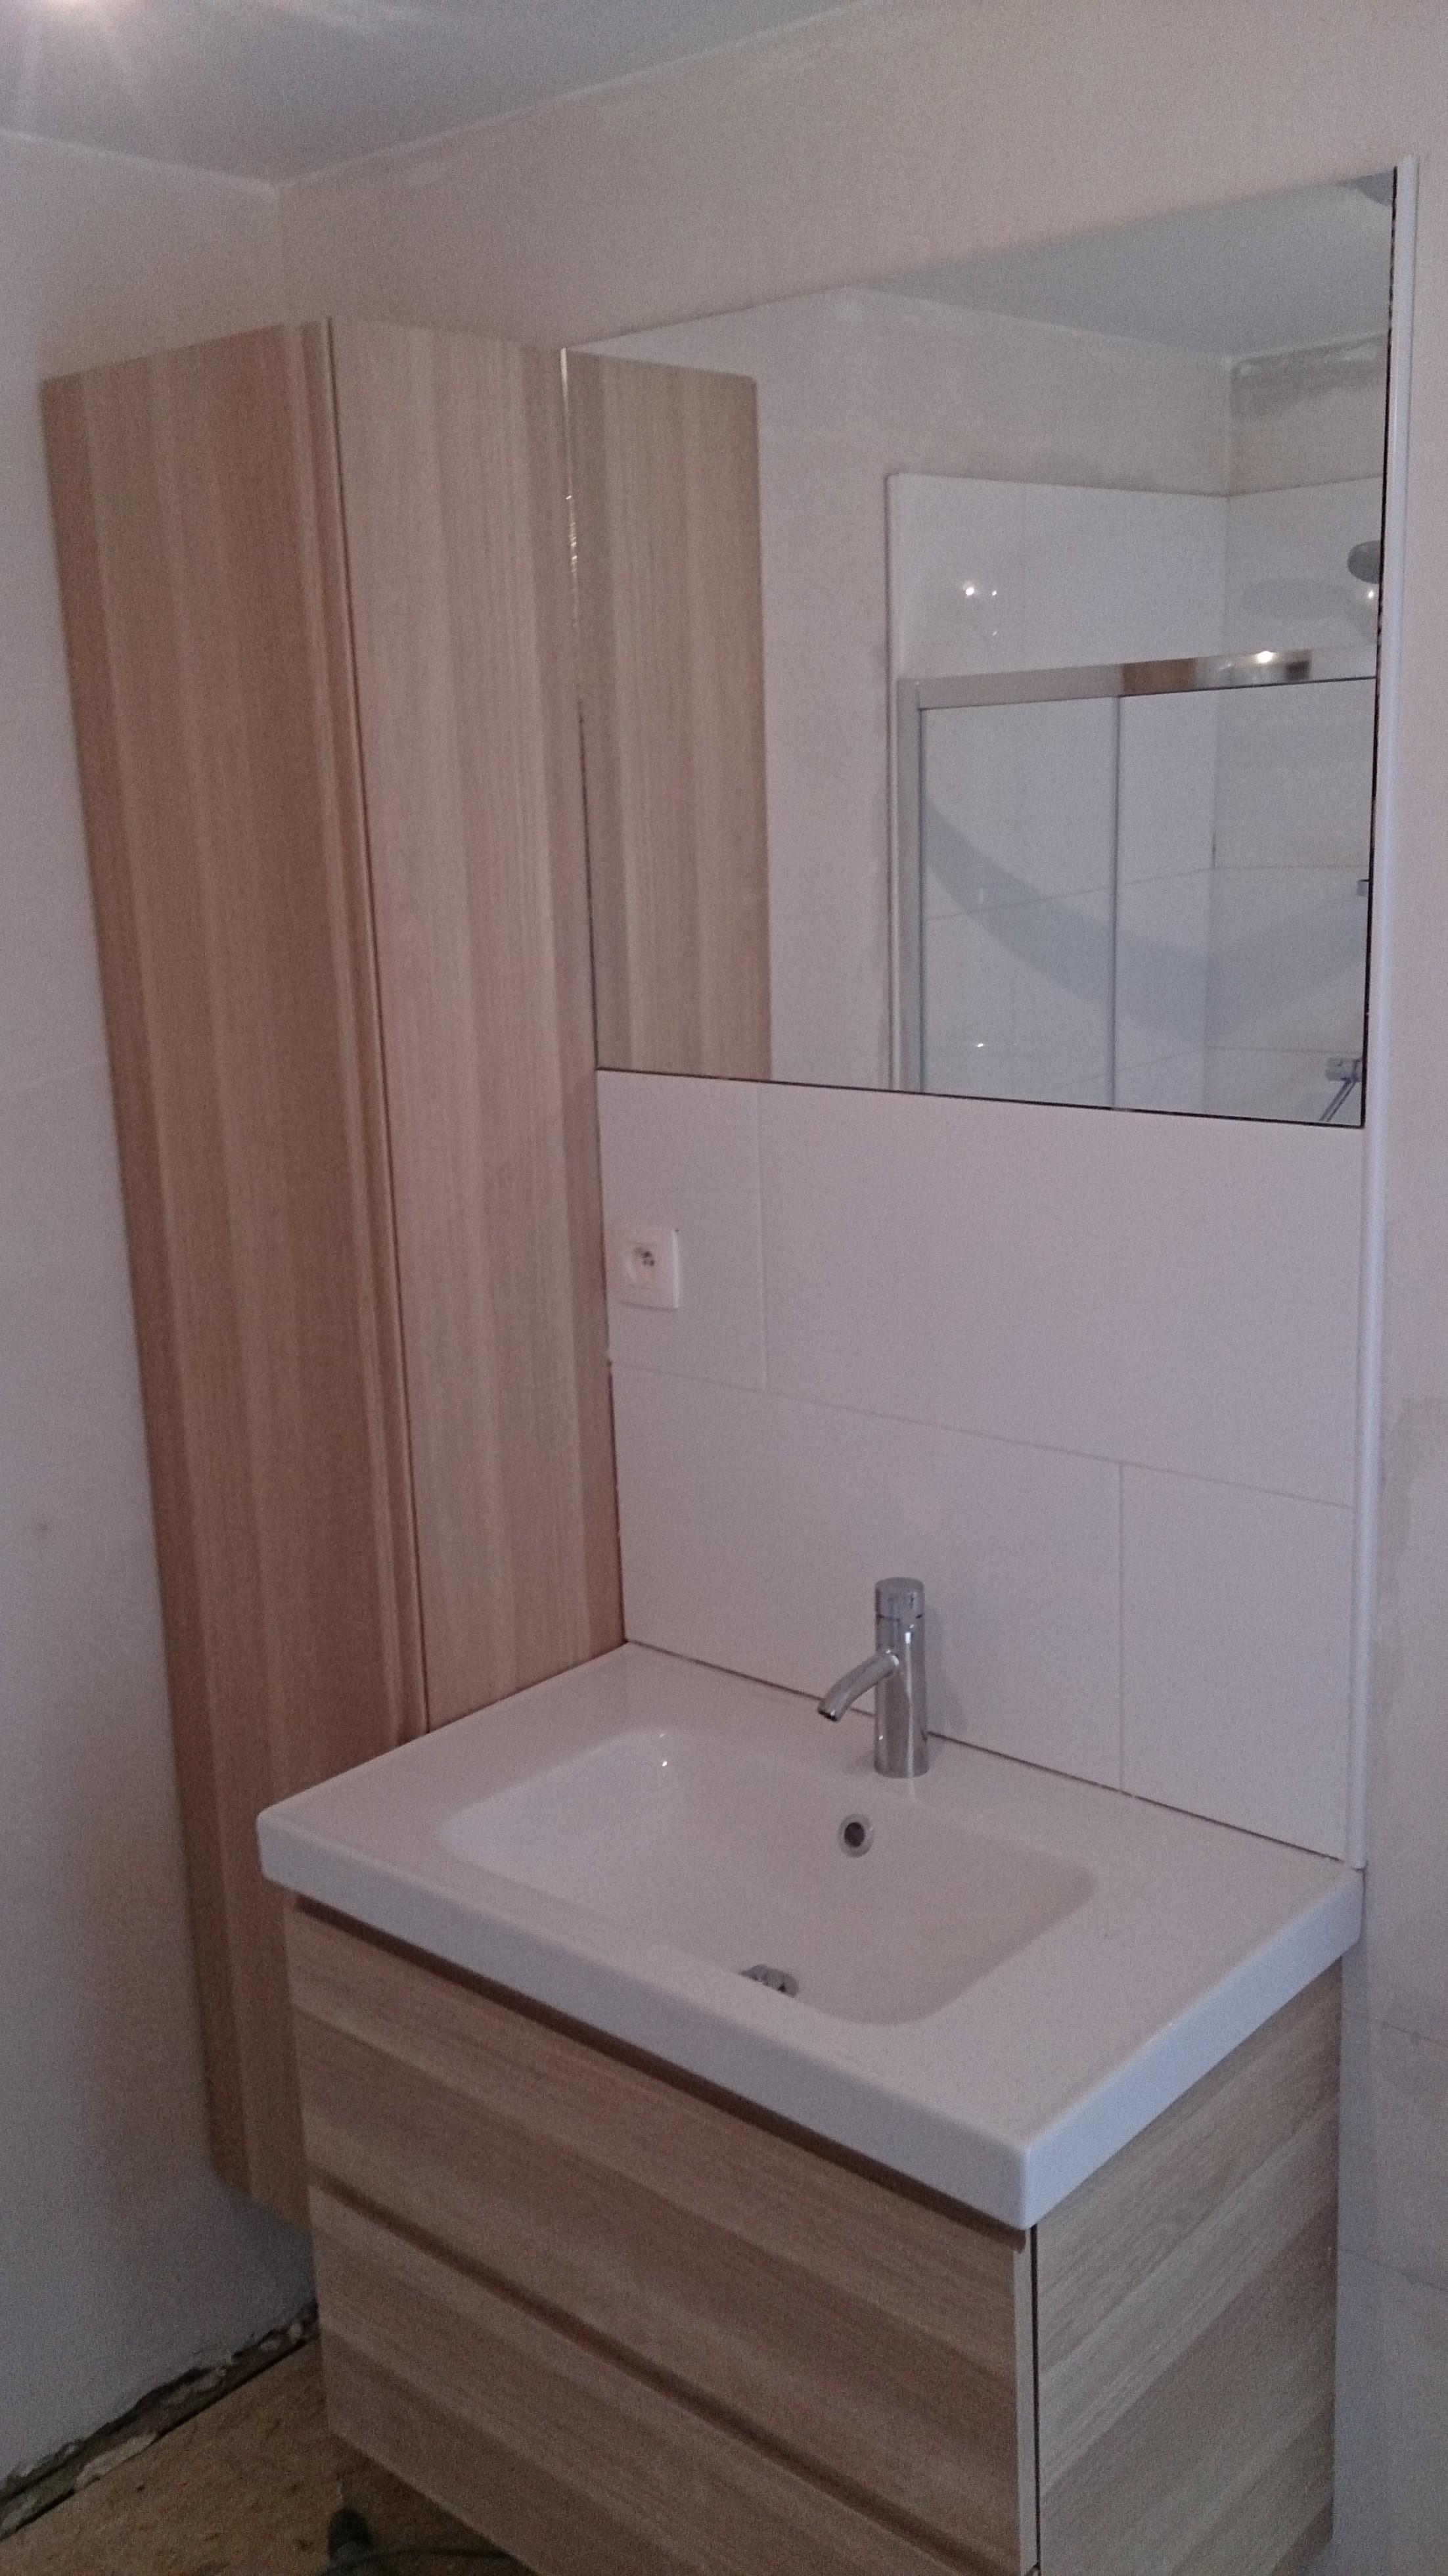 201 rooigemlaan 5 - Meubels originele badkamer ...